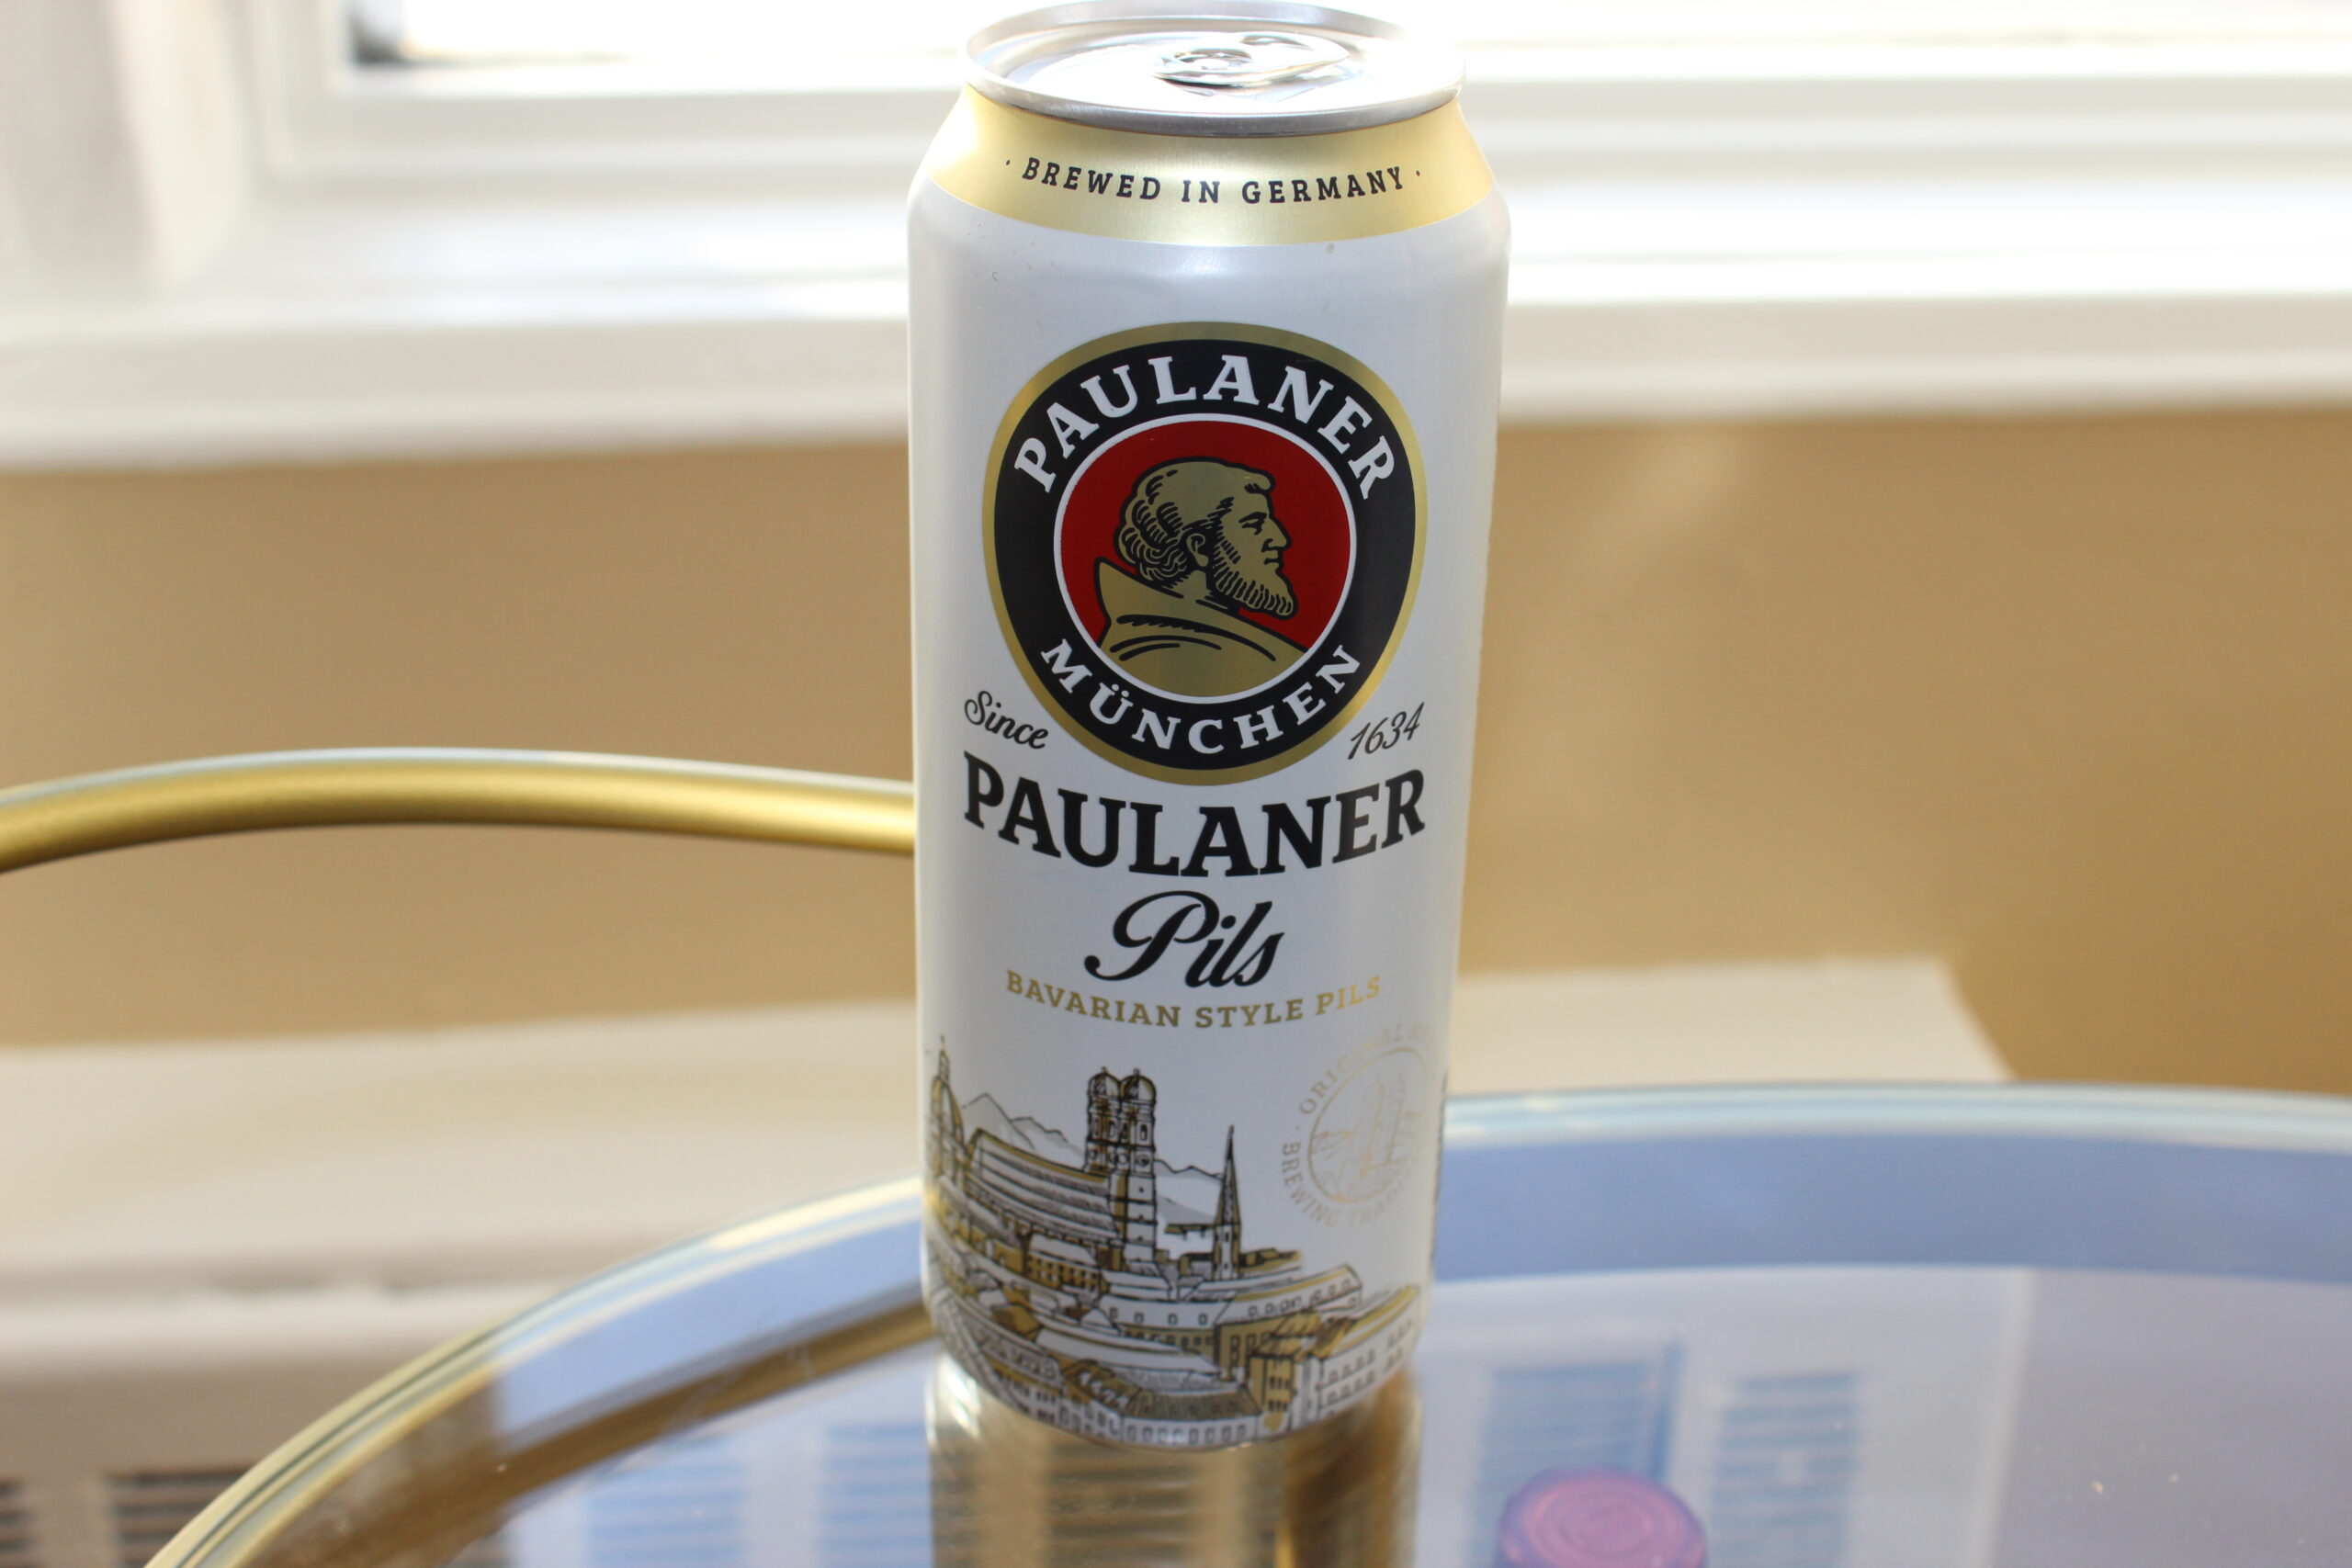 USA has brought back the Paulaner Pilsner